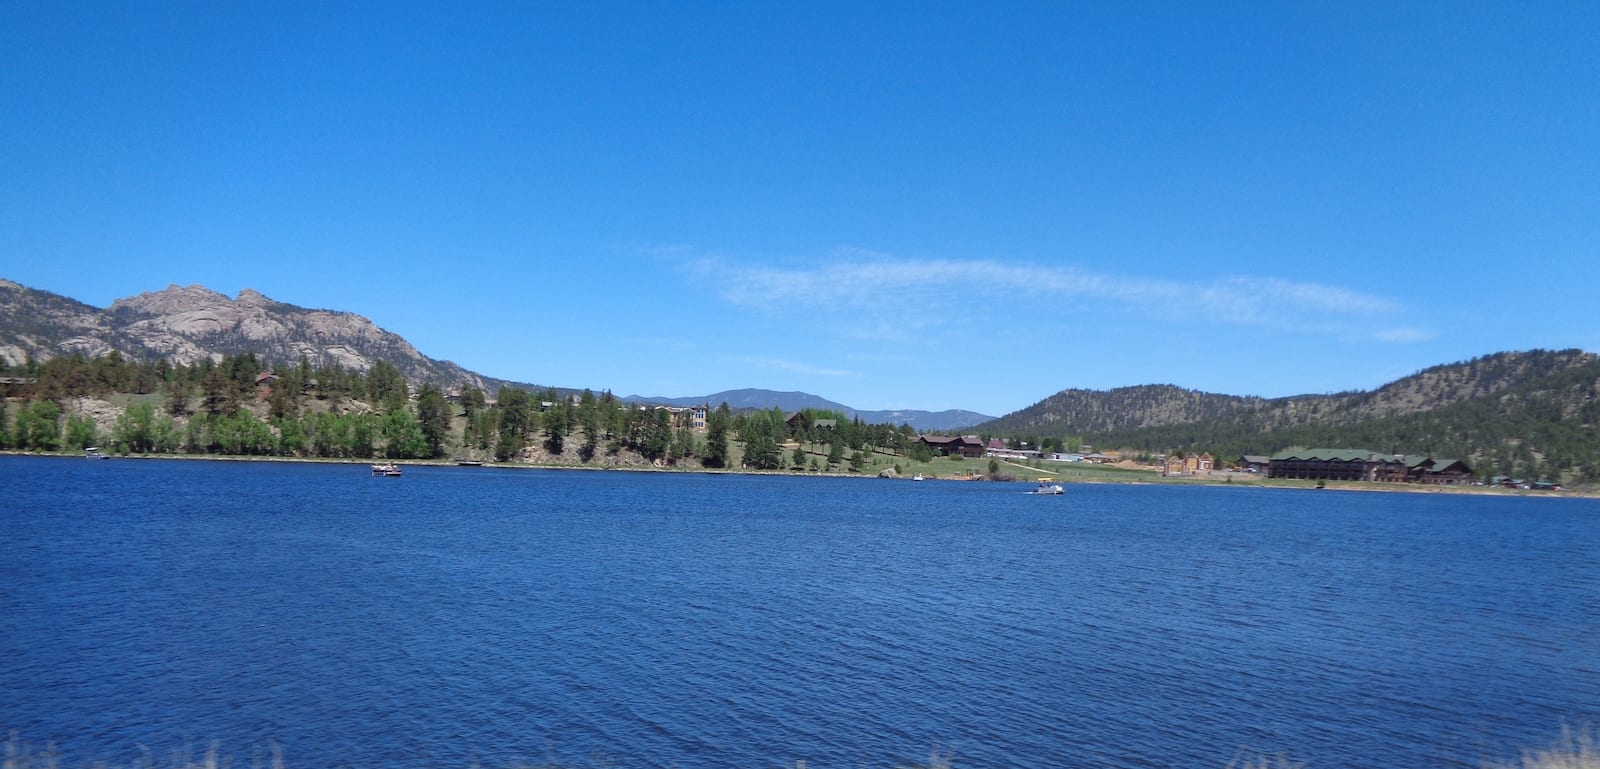 Lake Estes in Estes Park, Colorado